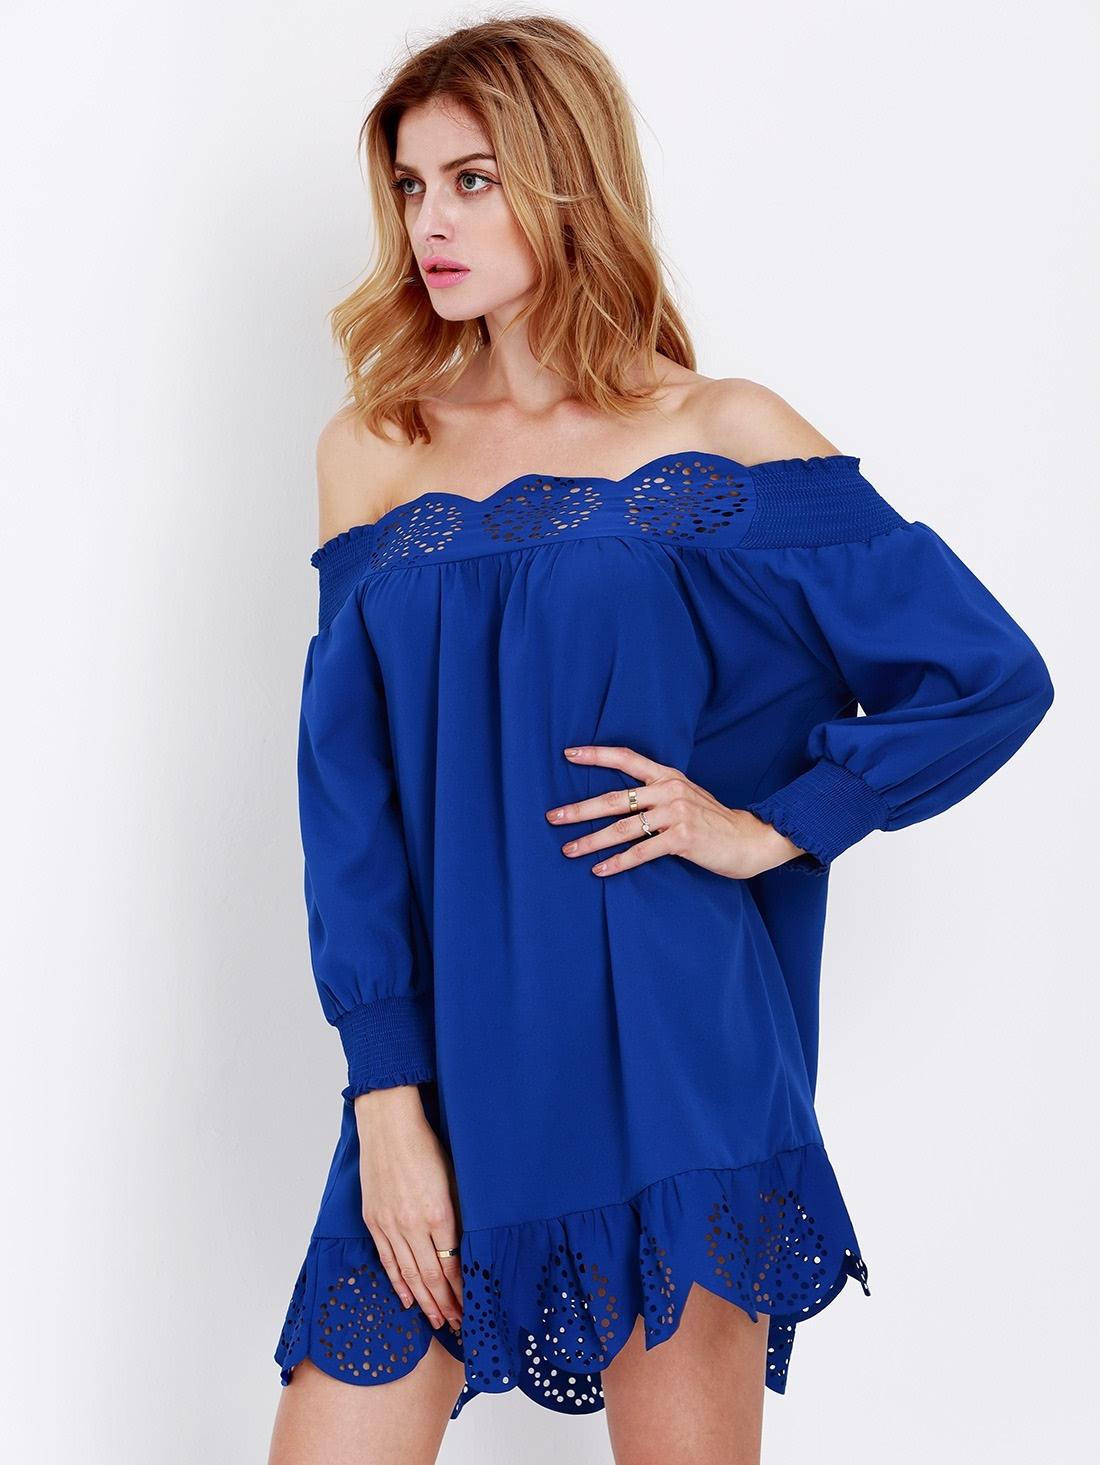 Designer Einzigartig Kleid Blau Langarm SpezialgebietAbend Kreativ Kleid Blau Langarm Spezialgebiet